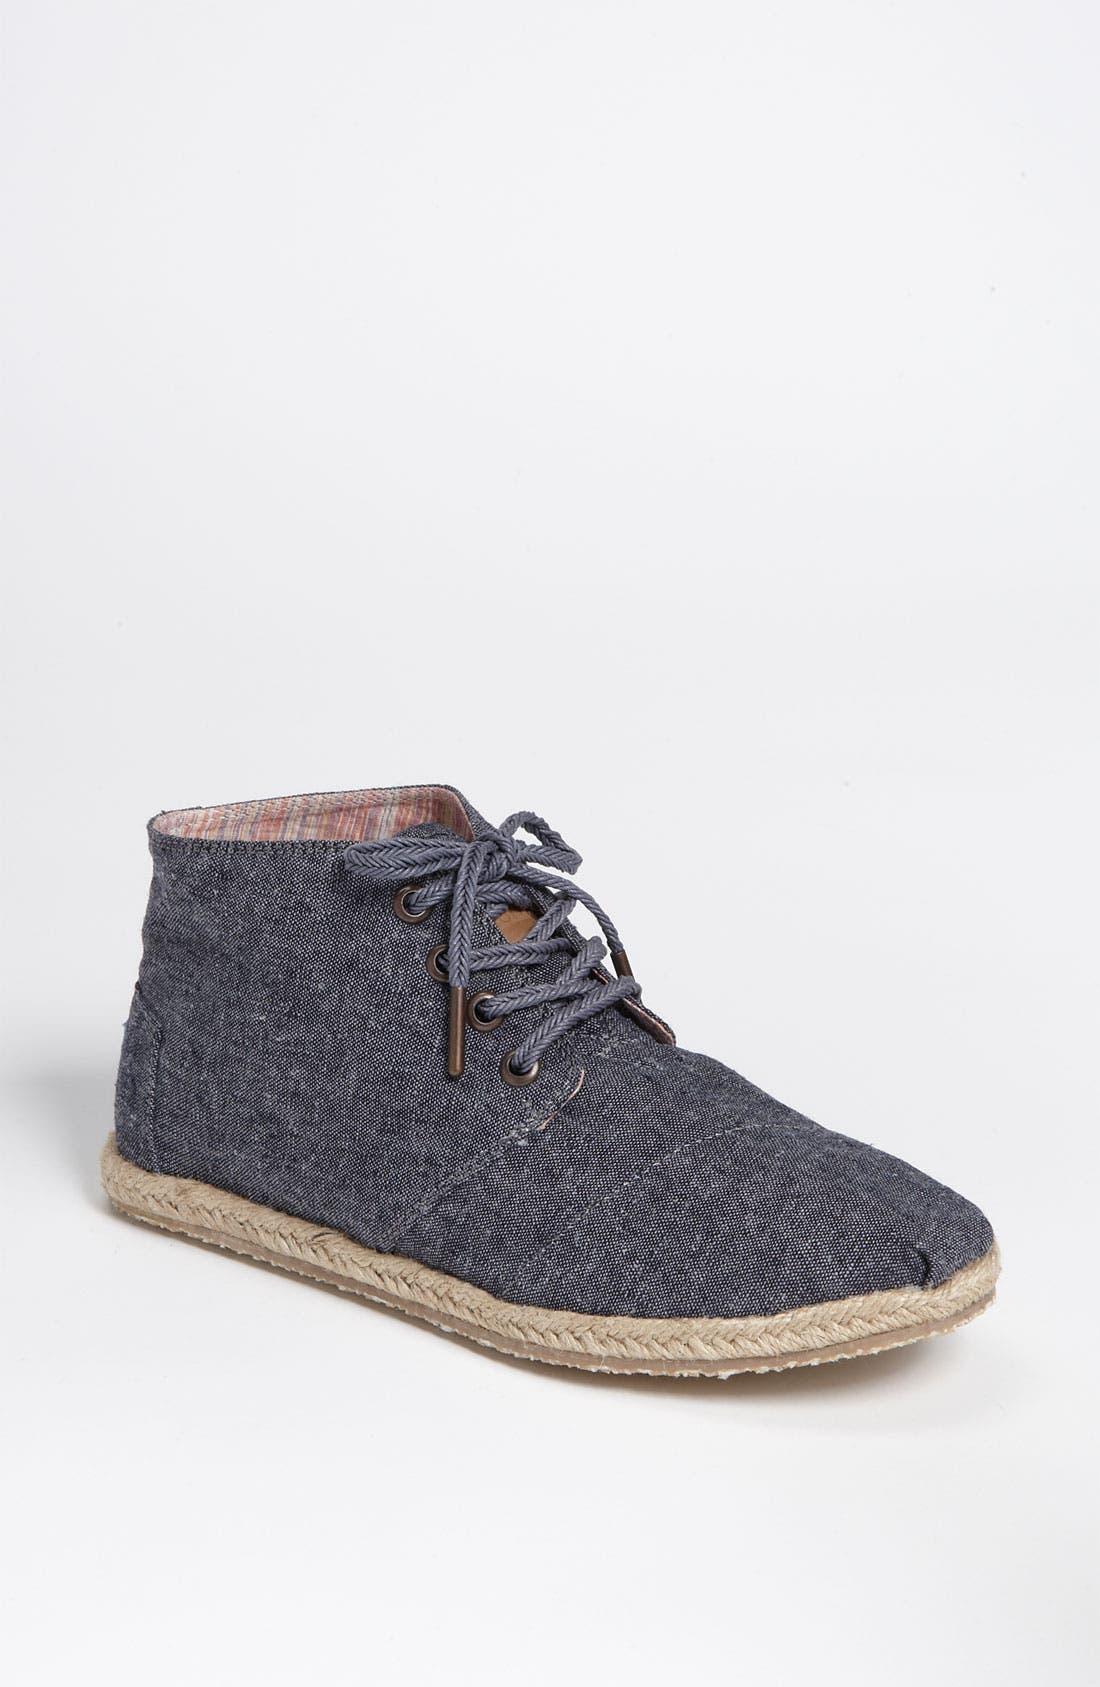 Alternate Image 1 Selected - TOMS 'Botas Desert - Bristol' Boot (Women)